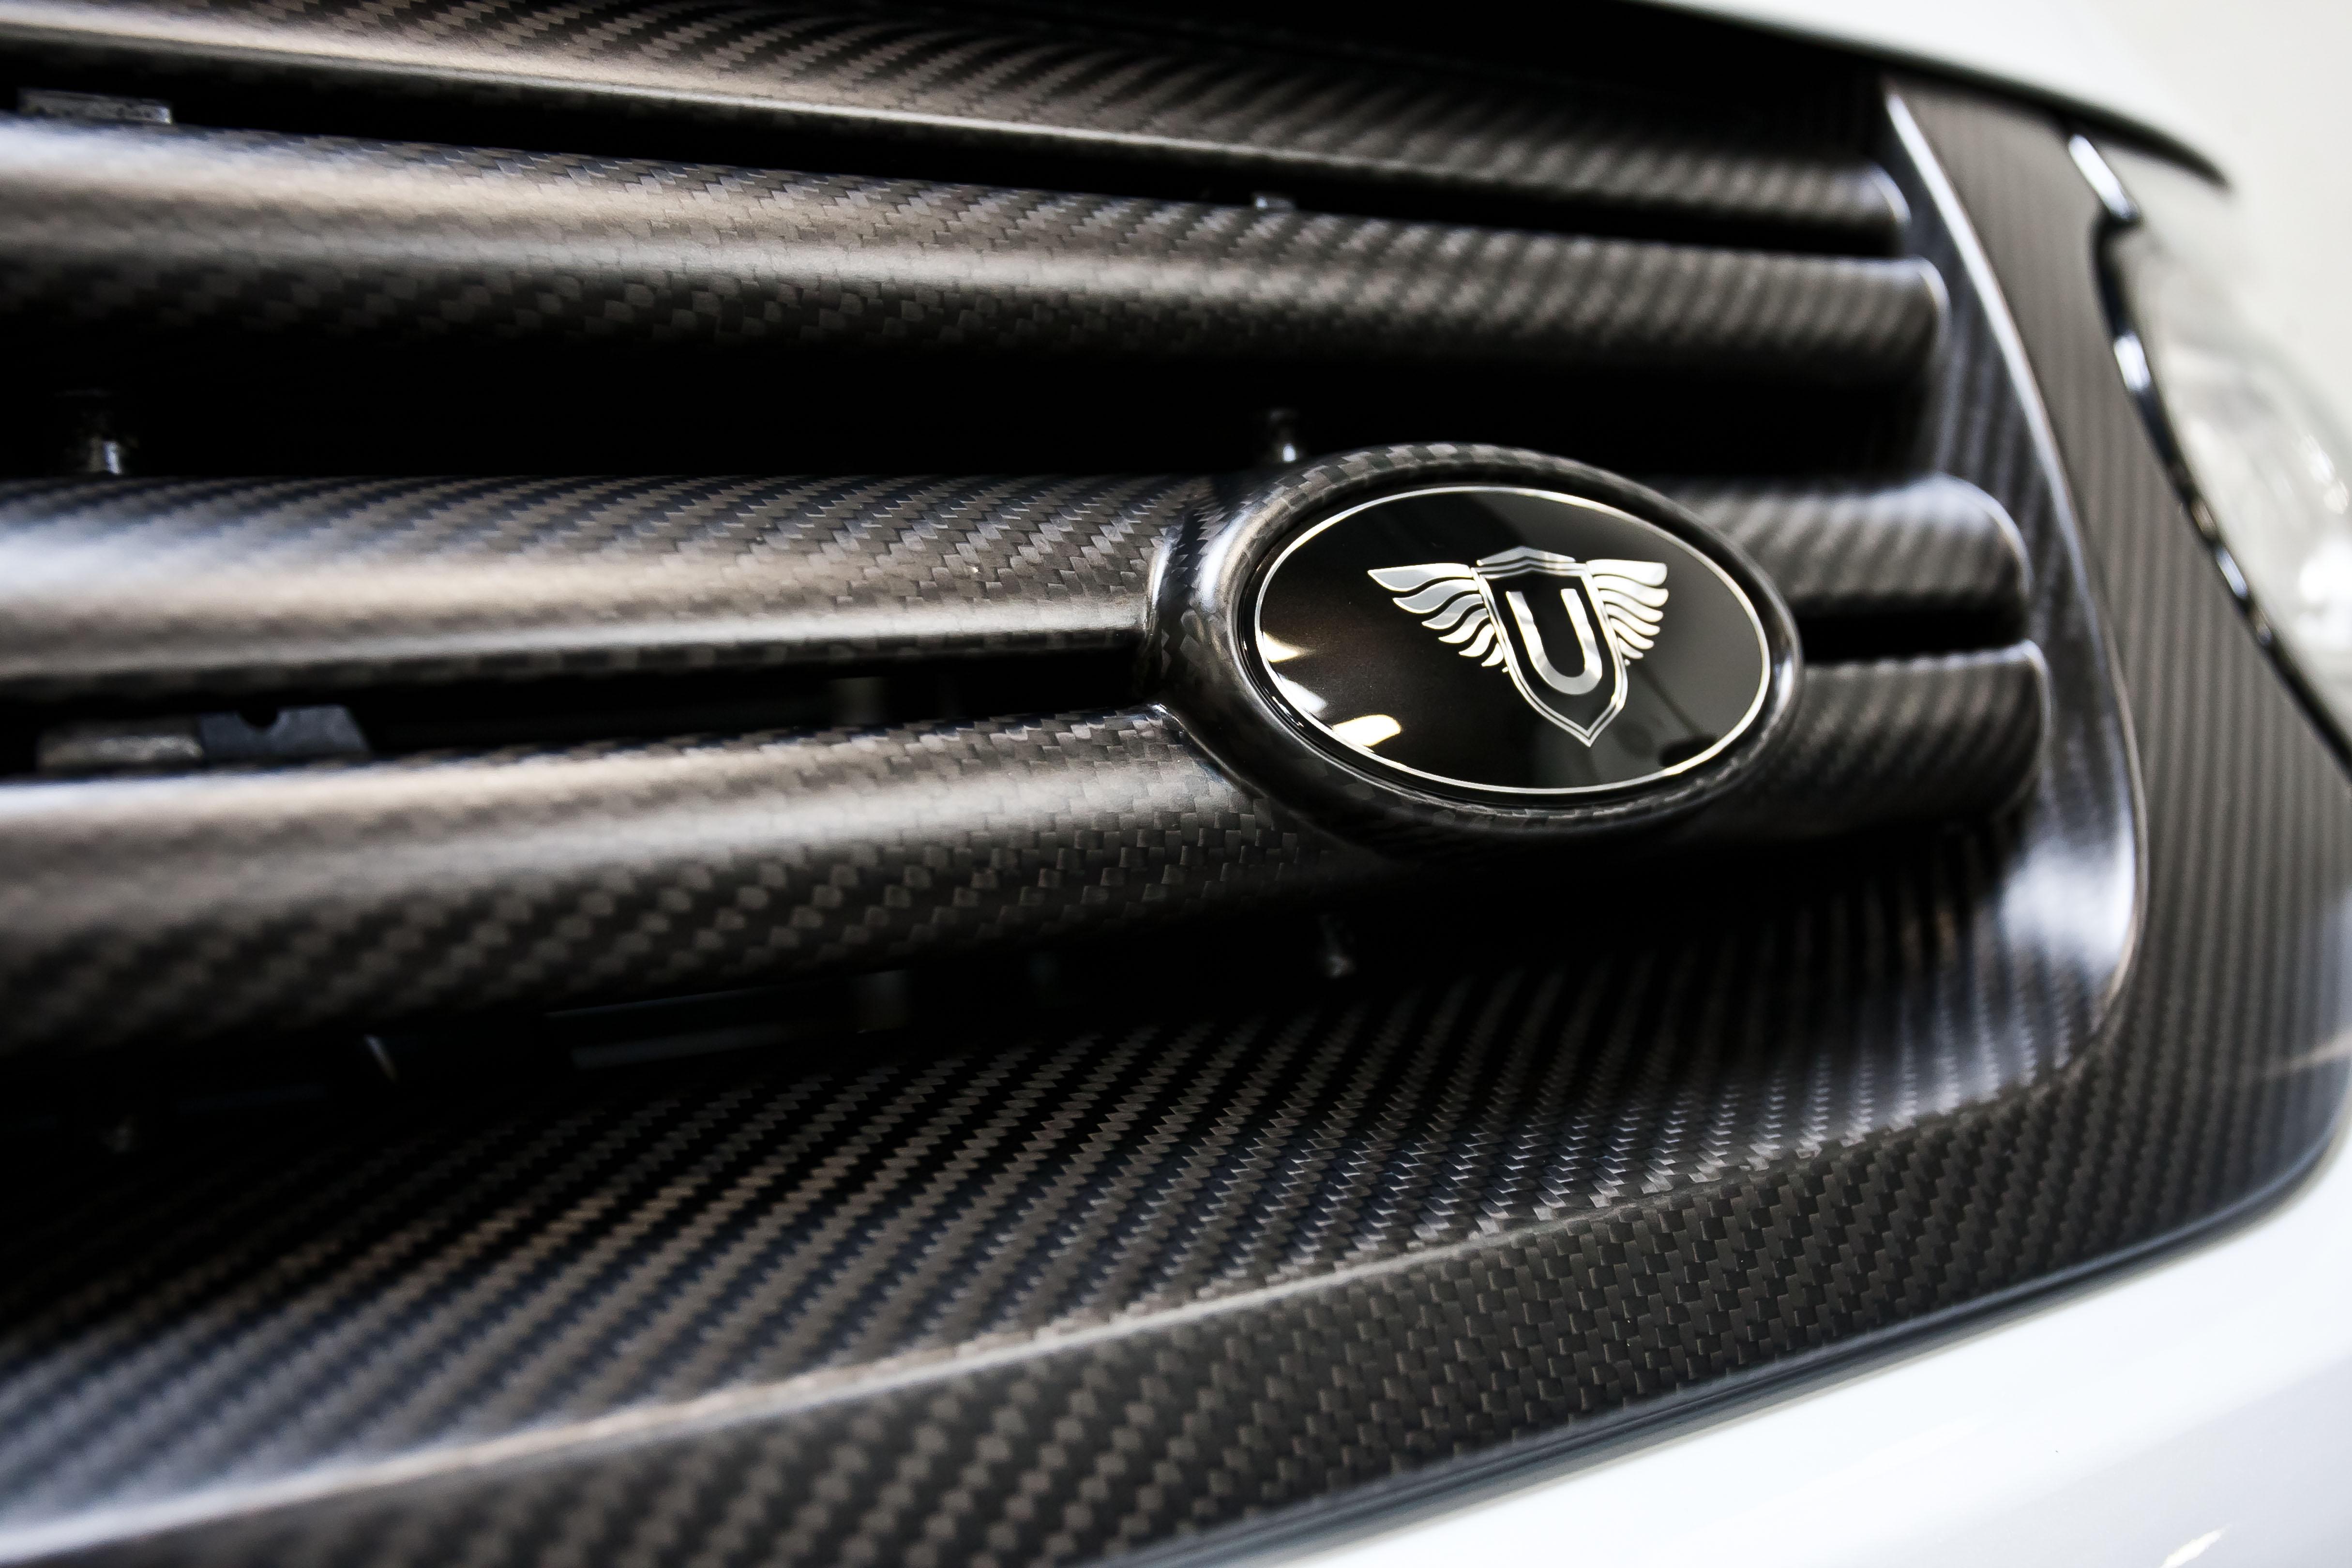 Range Rover SVR Yulong Matte Carbon8